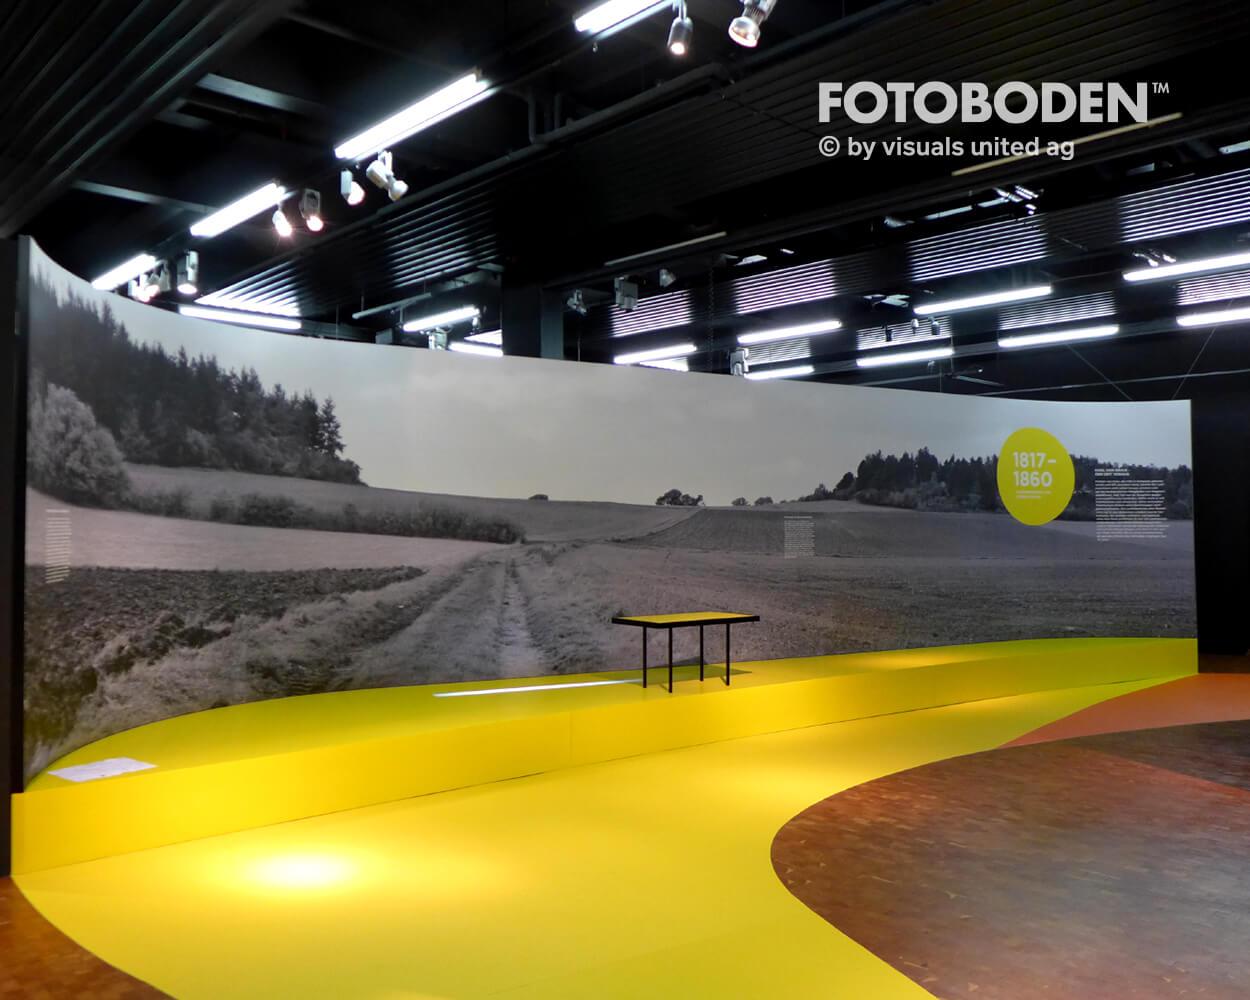 Fahrrad5 Ausstellung Museum  Raumkonzept Stimmung Museumsboden Ausstellungsboden Fotoboden Vinylboden Flooring Individuell Event